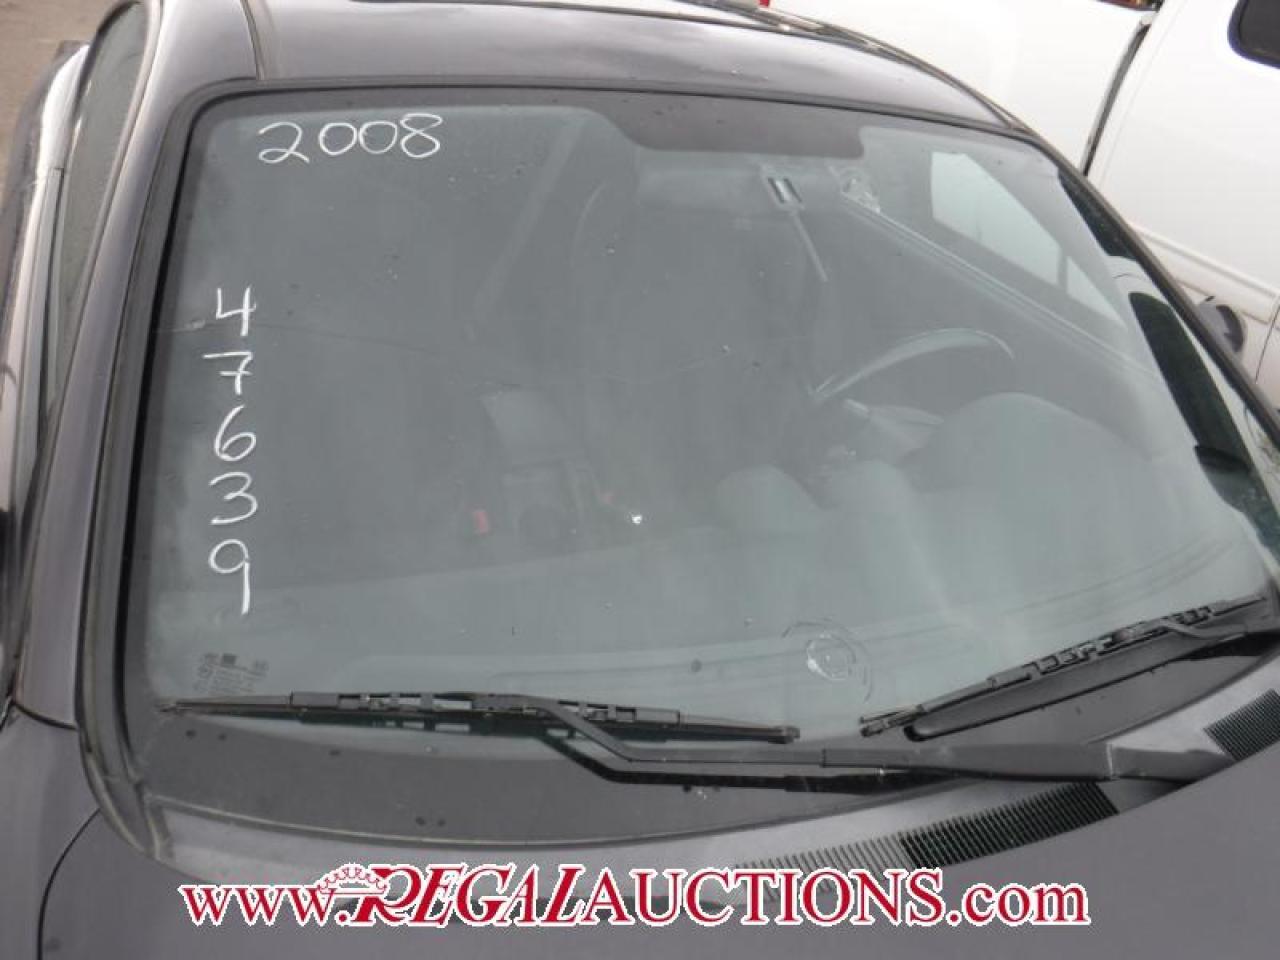 Photo of Grey 2008 Hyundai Tiburon